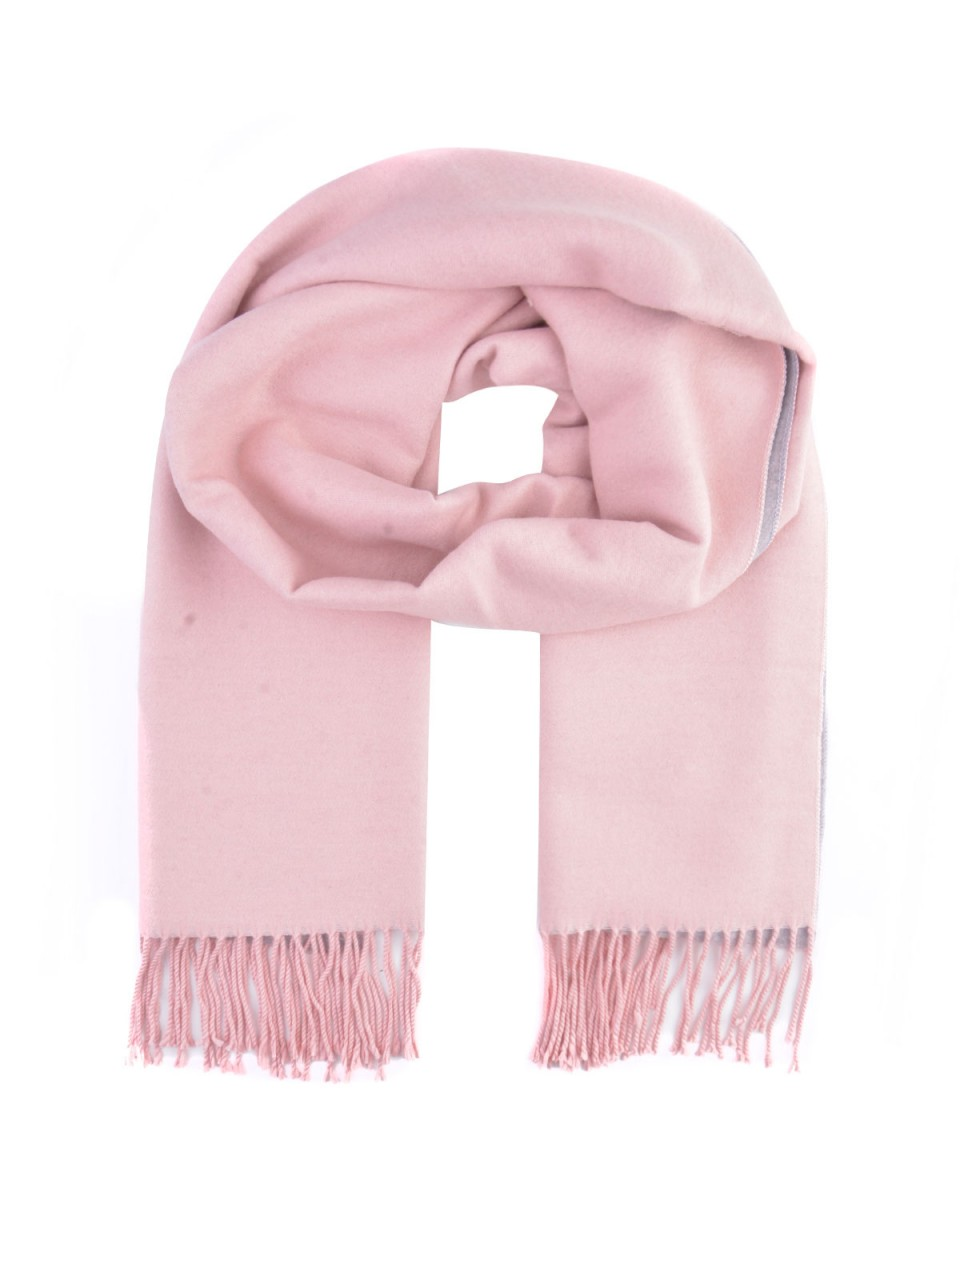 Schals - MILANO ITALY Damen Schal, rosa  - Onlineshop Designermode.com